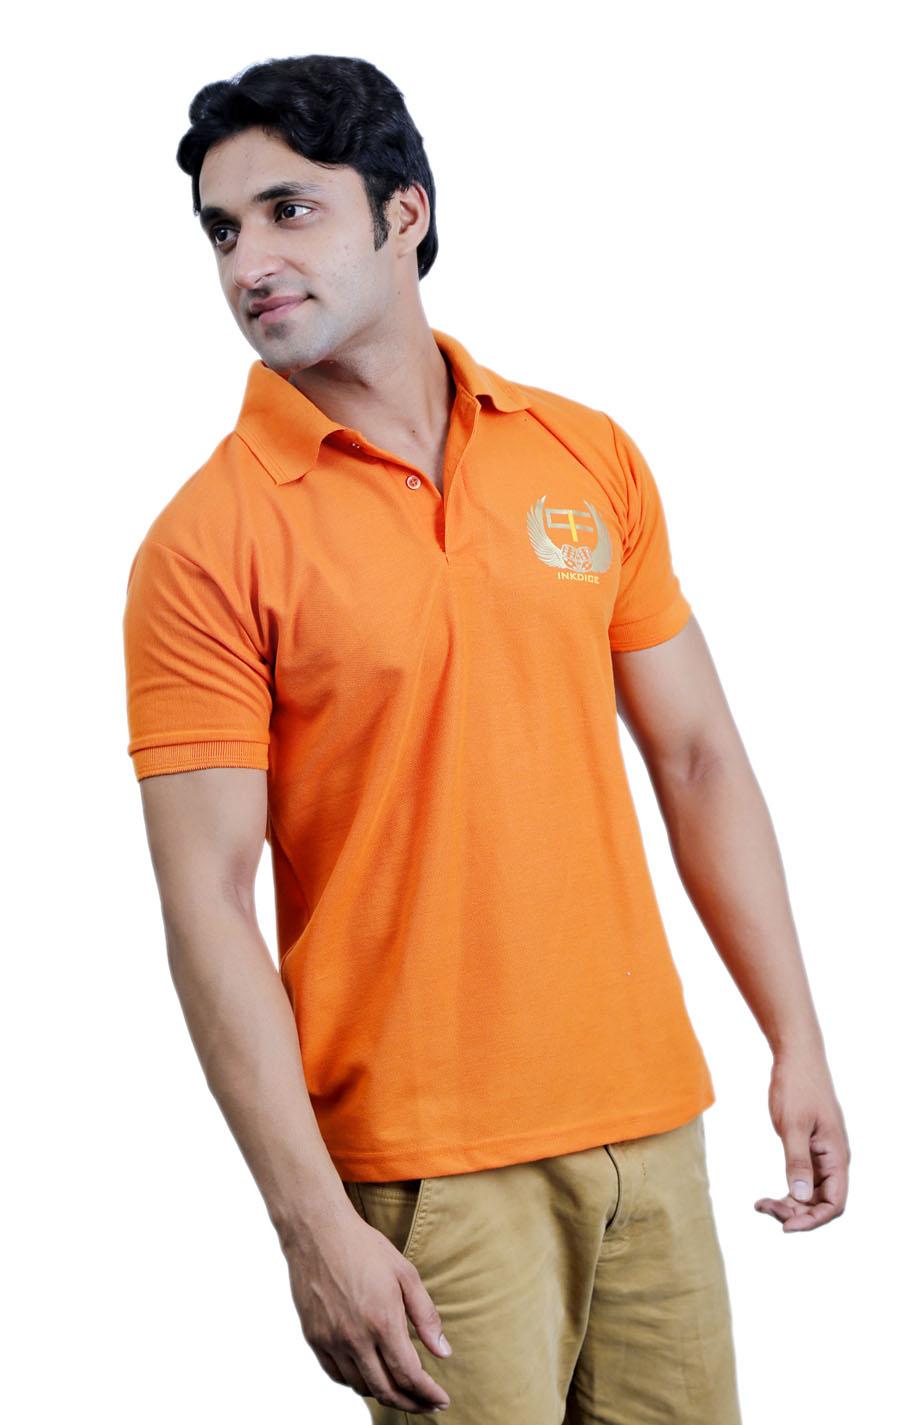 Fashion men 39 s apparel western wear polos for Orange polo shirt mens